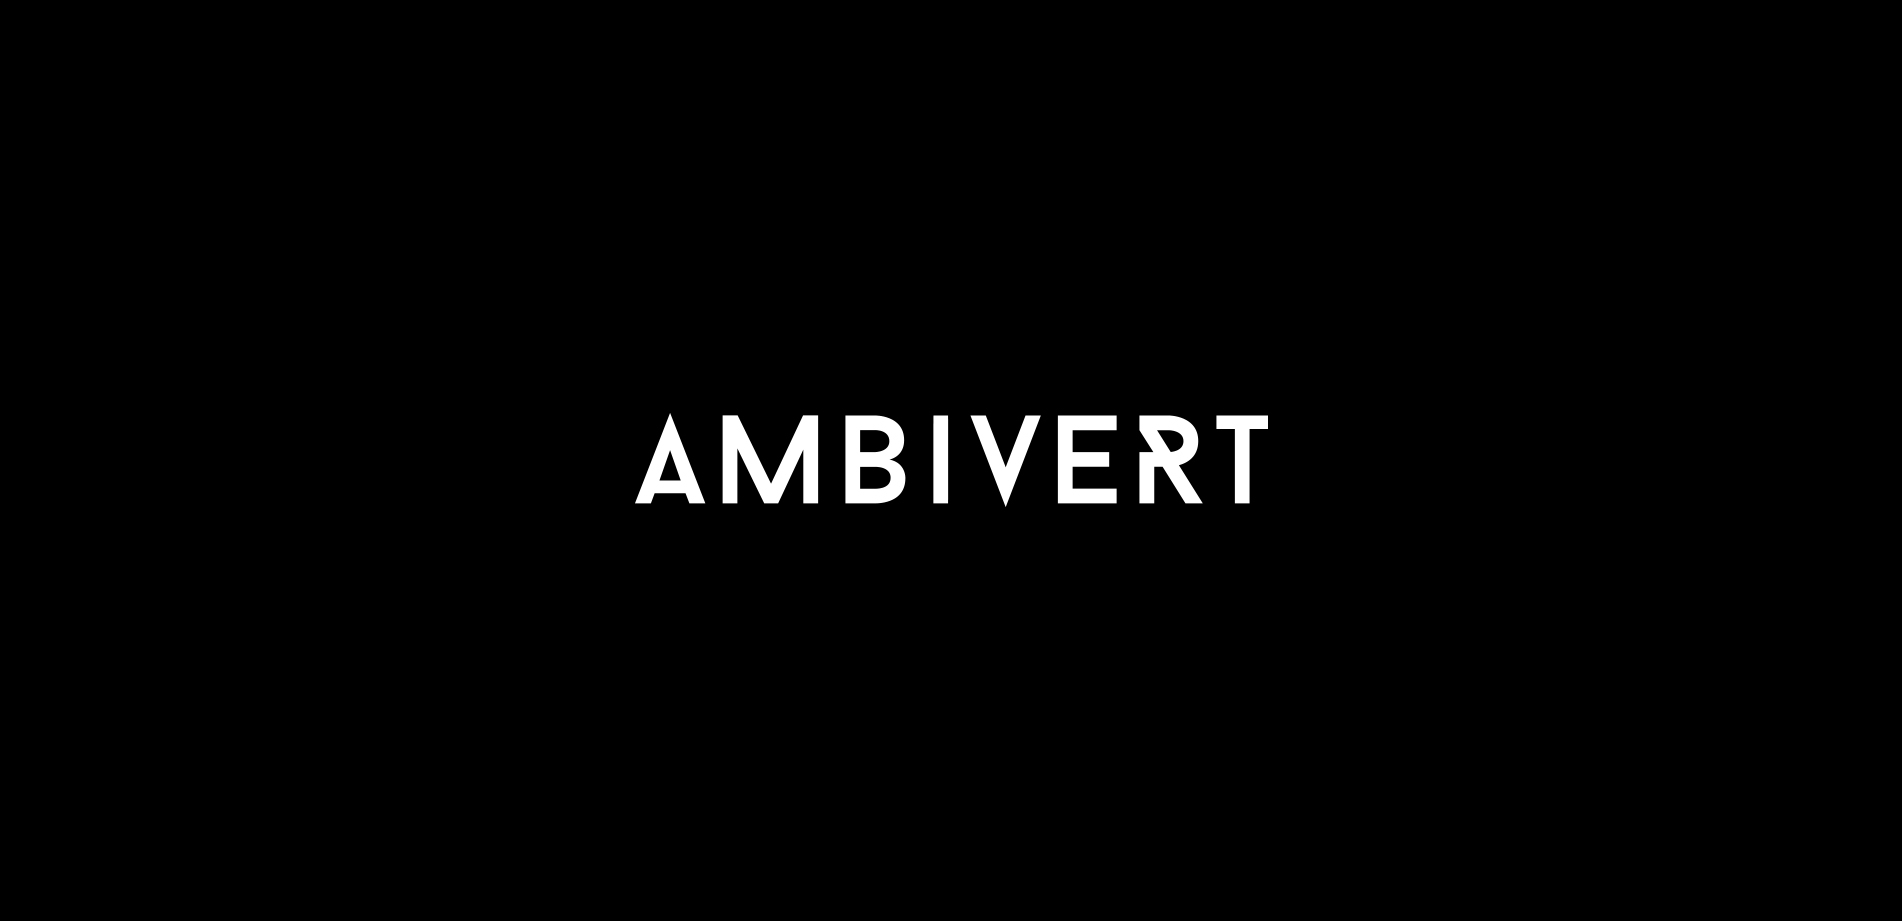 Ambivert-Slides-1